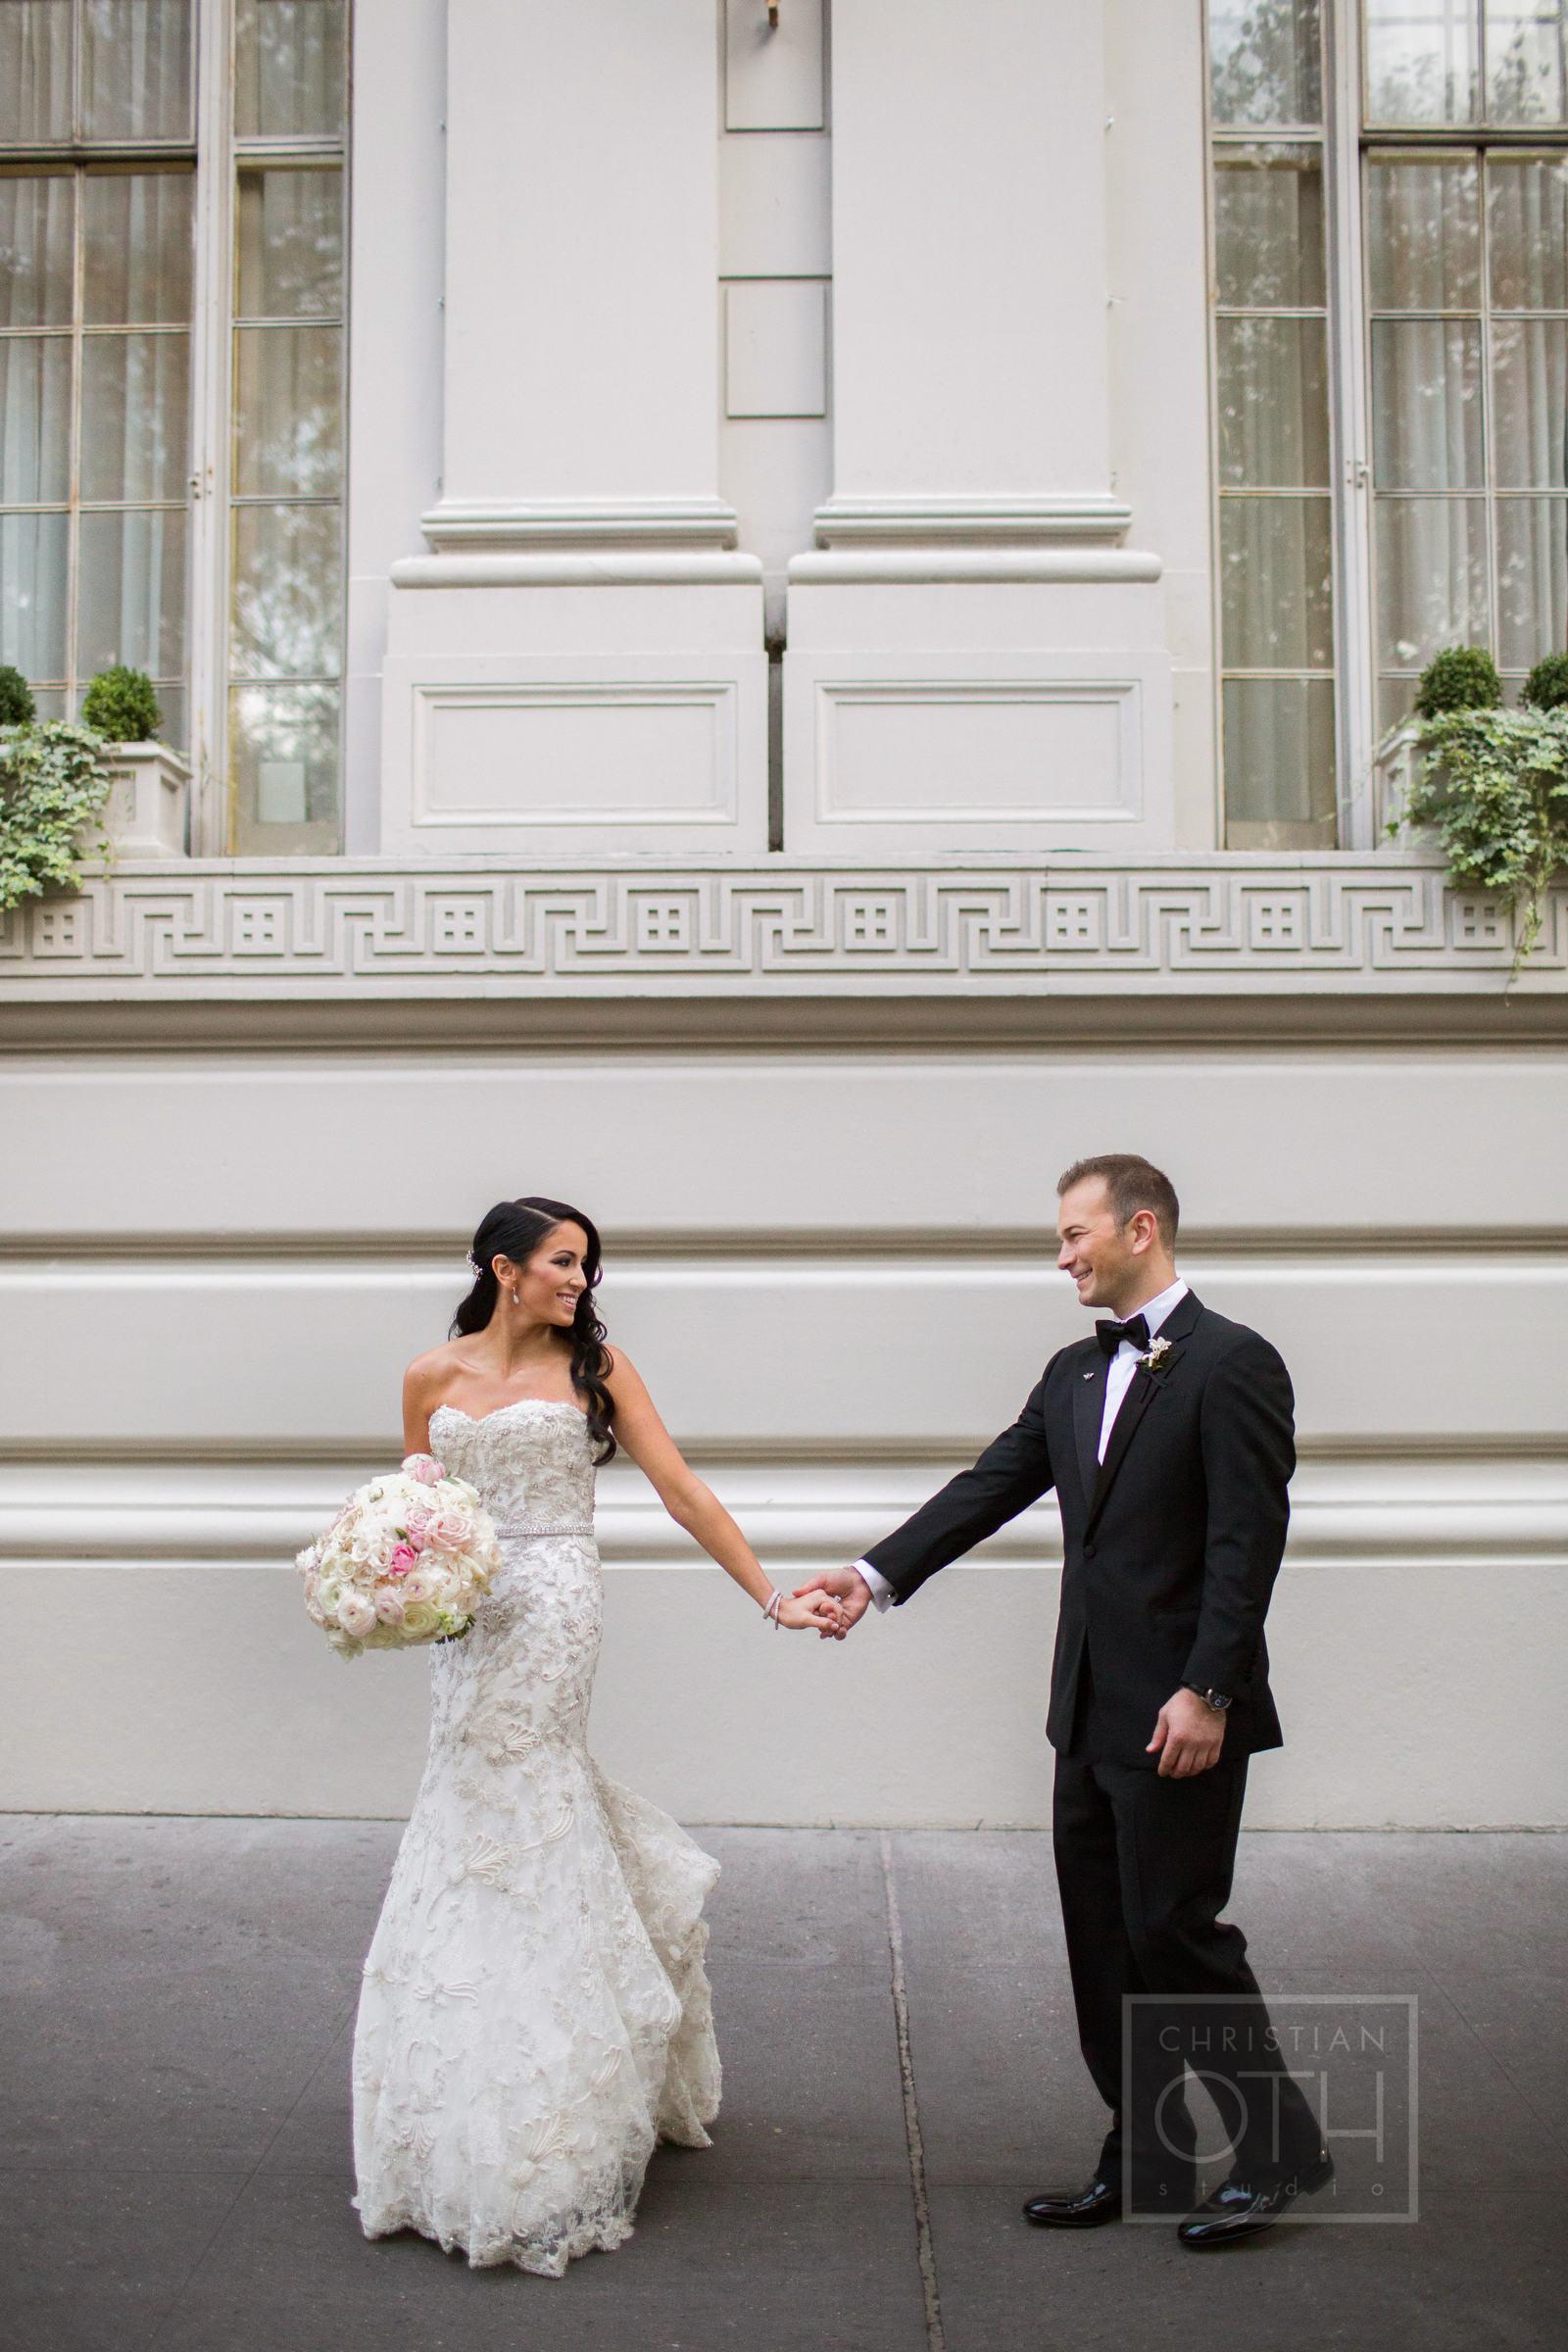 Ceci_New_York_Custom_Invitation_Pierre__City_ Destination_Wedding_Luxury_Personalized_Ceci_Style_Bride_Rose_Gold_Foil_Stamping3.JPG